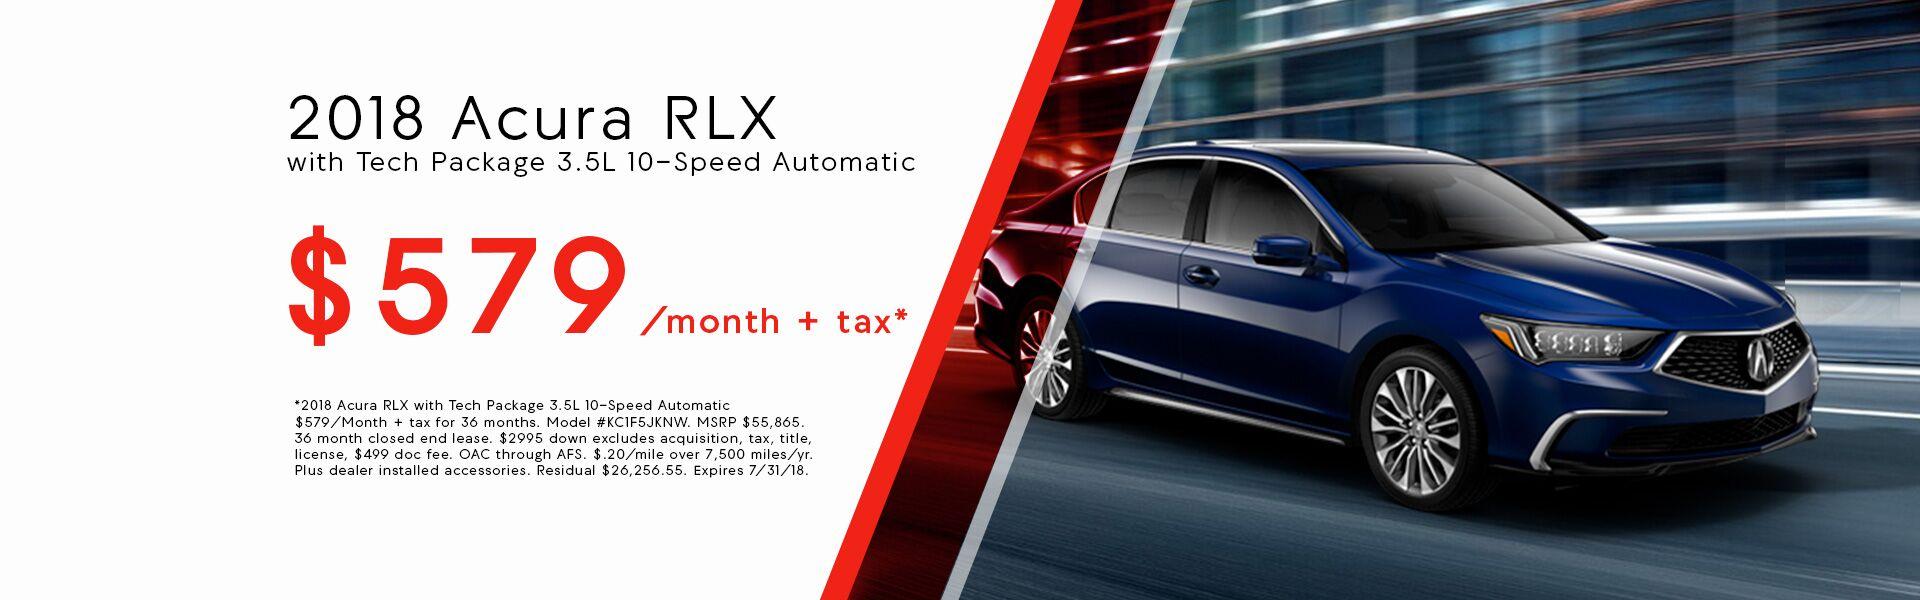 2018 Acura RLX